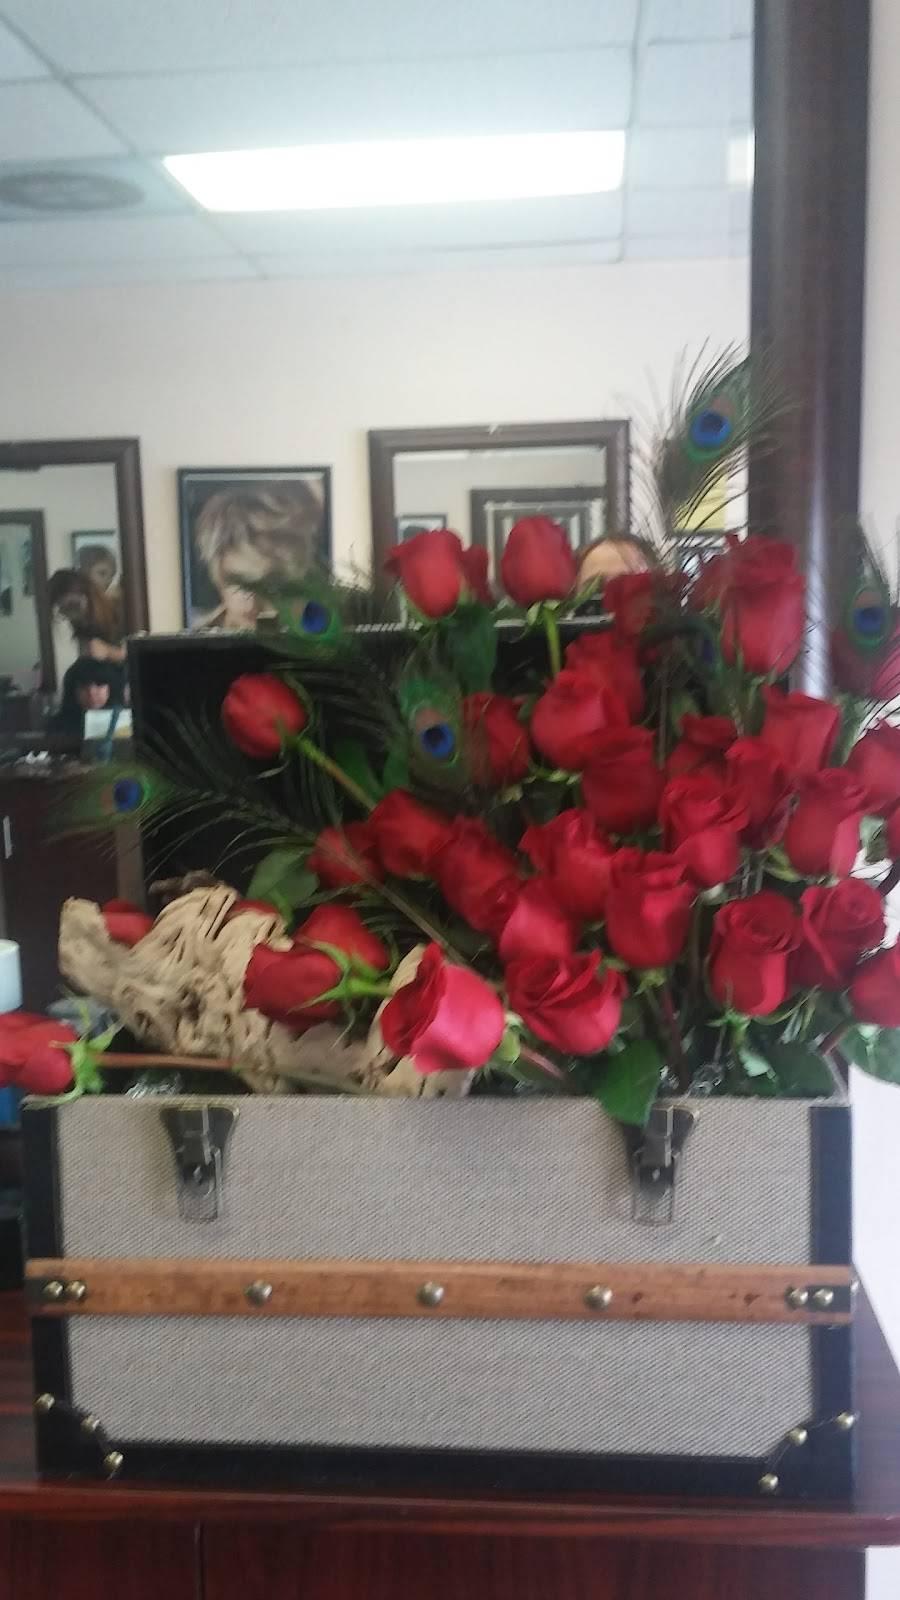 BELLA ROSE - florist  | Photo 3 of 6 | Address: 303 Foothill Blvd, Rialto, CA 92376, USA | Phone: (909) 820-9630